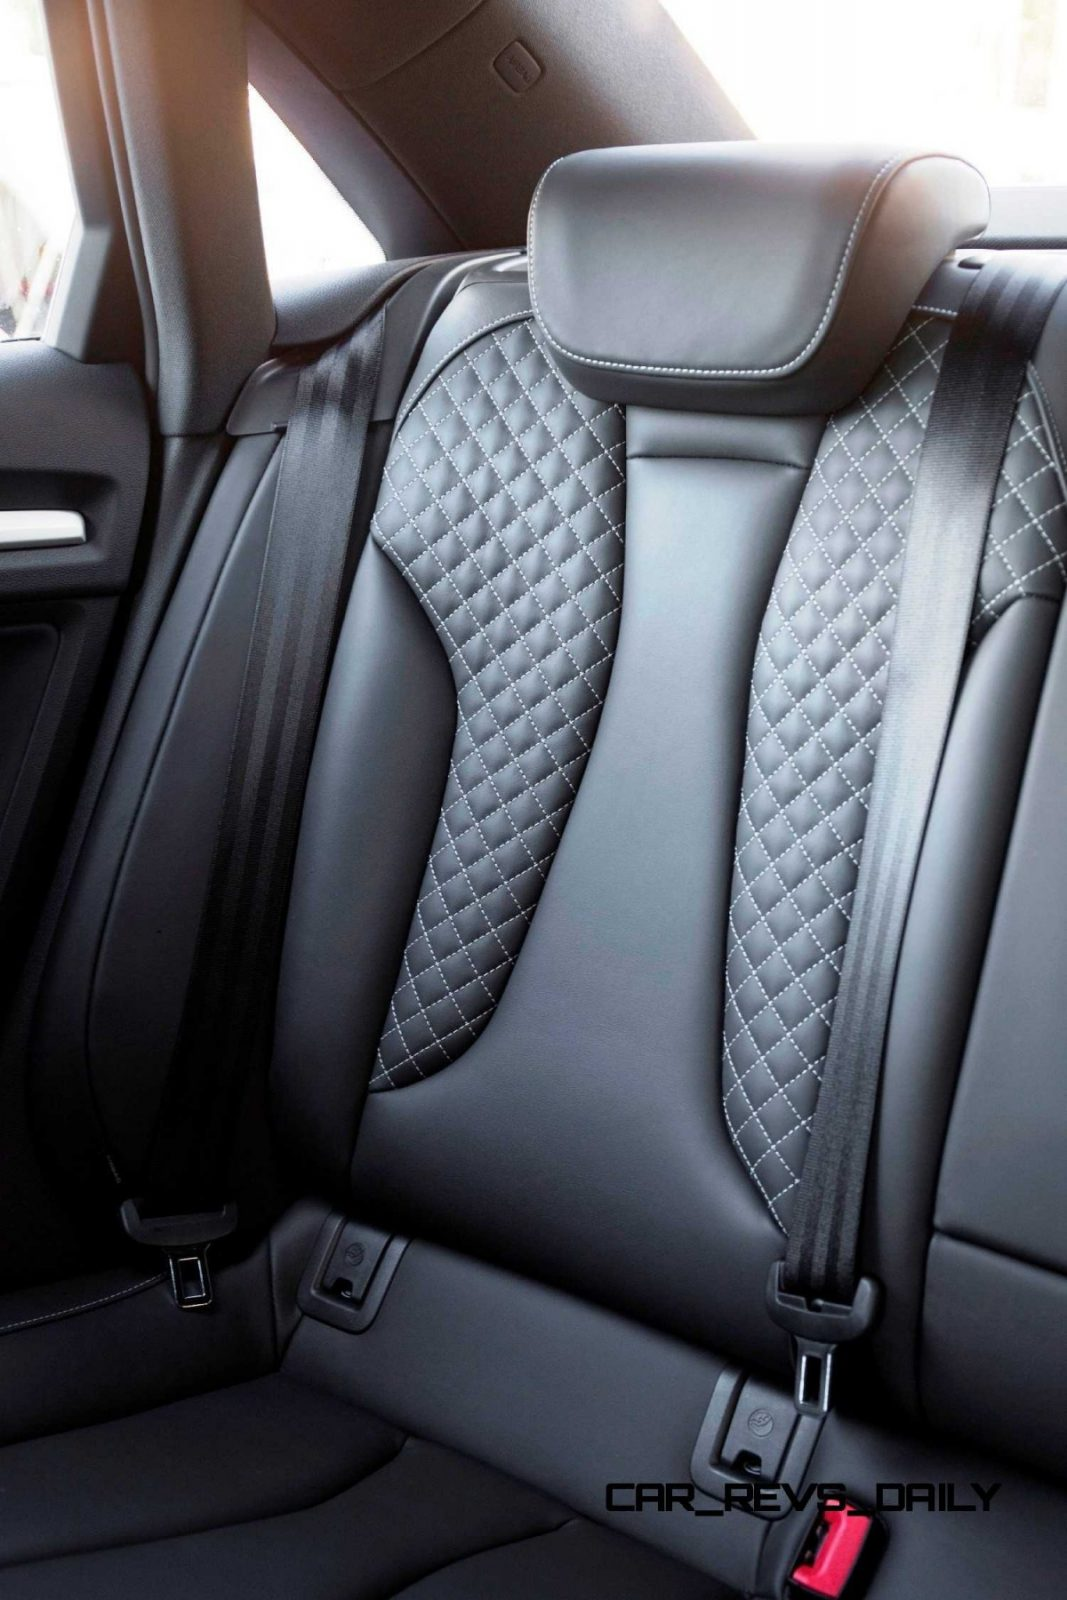 CarRevsDaily - 2015 Audi S3 Interior 12